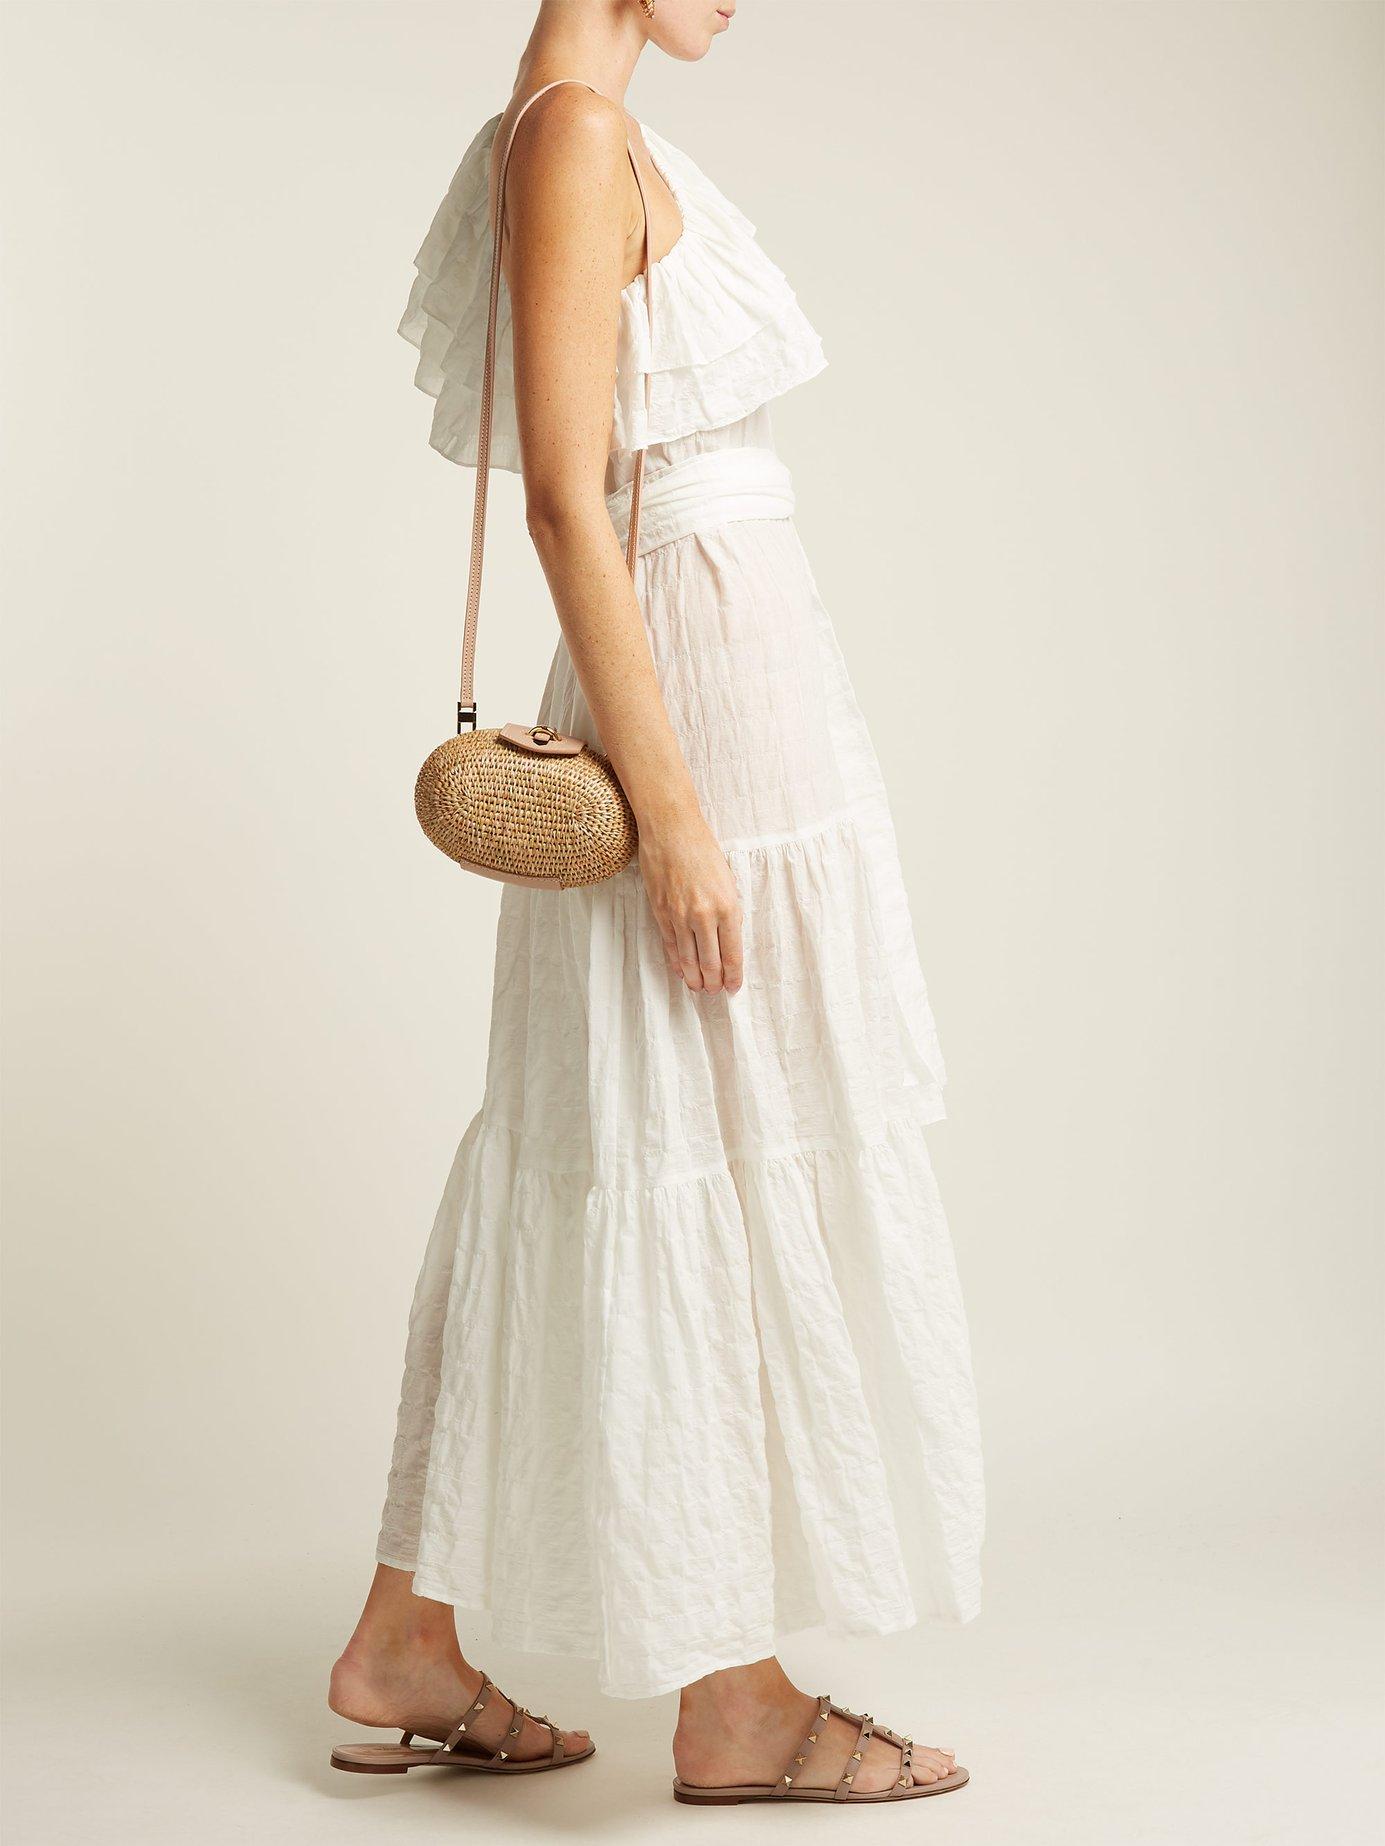 Arden one-shoulder cotton-blend seersucker dress by Lisa Marie Fernandez